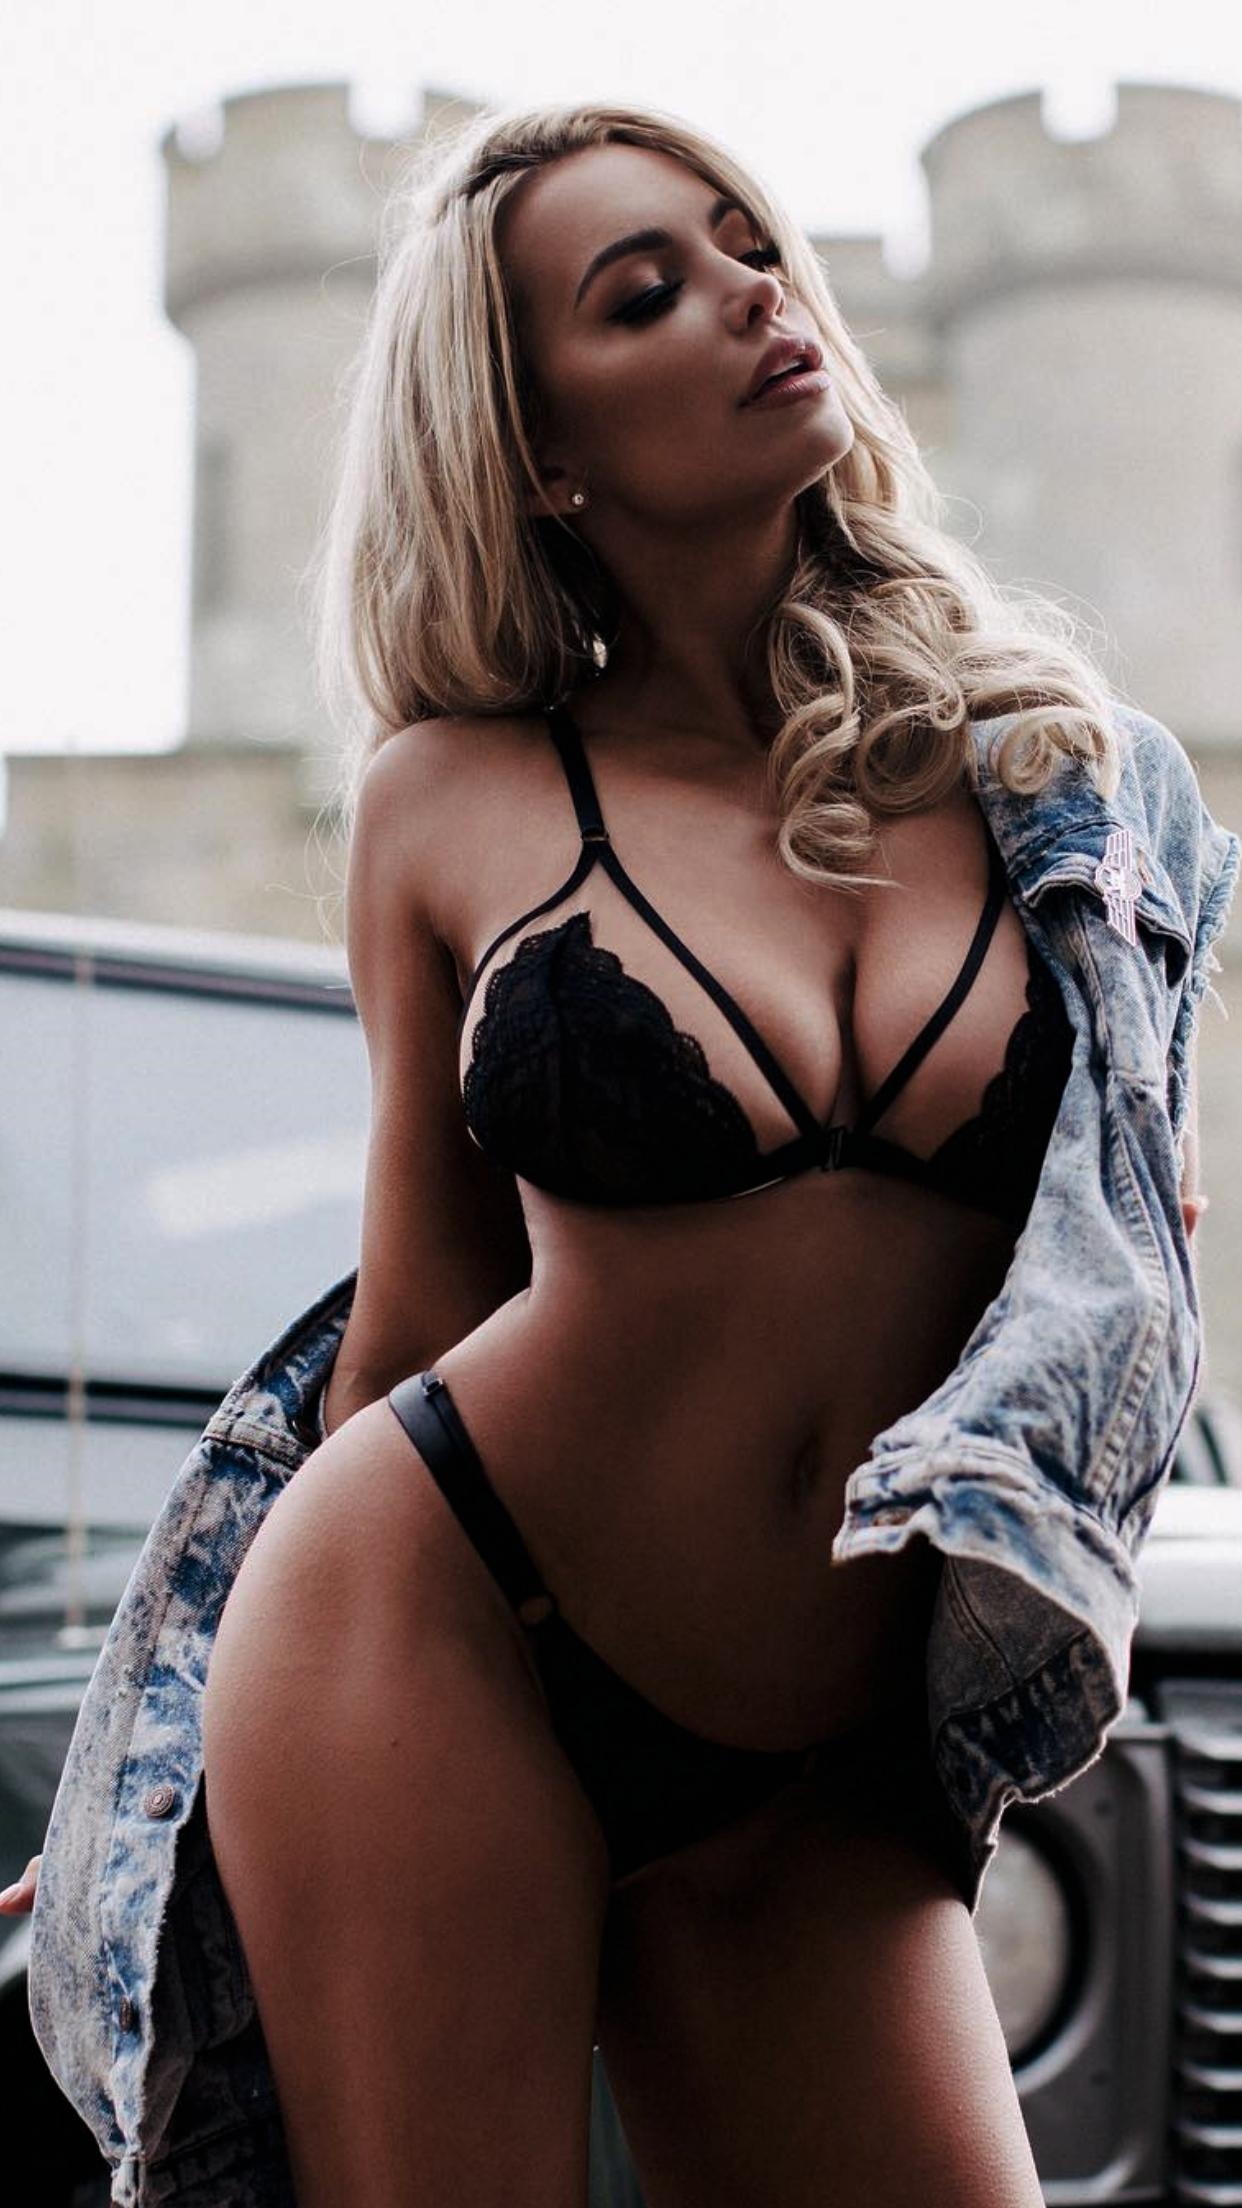 Sex Jimena Garcia nude (94 foto and video), Sexy, Sideboobs, Feet, legs 2020